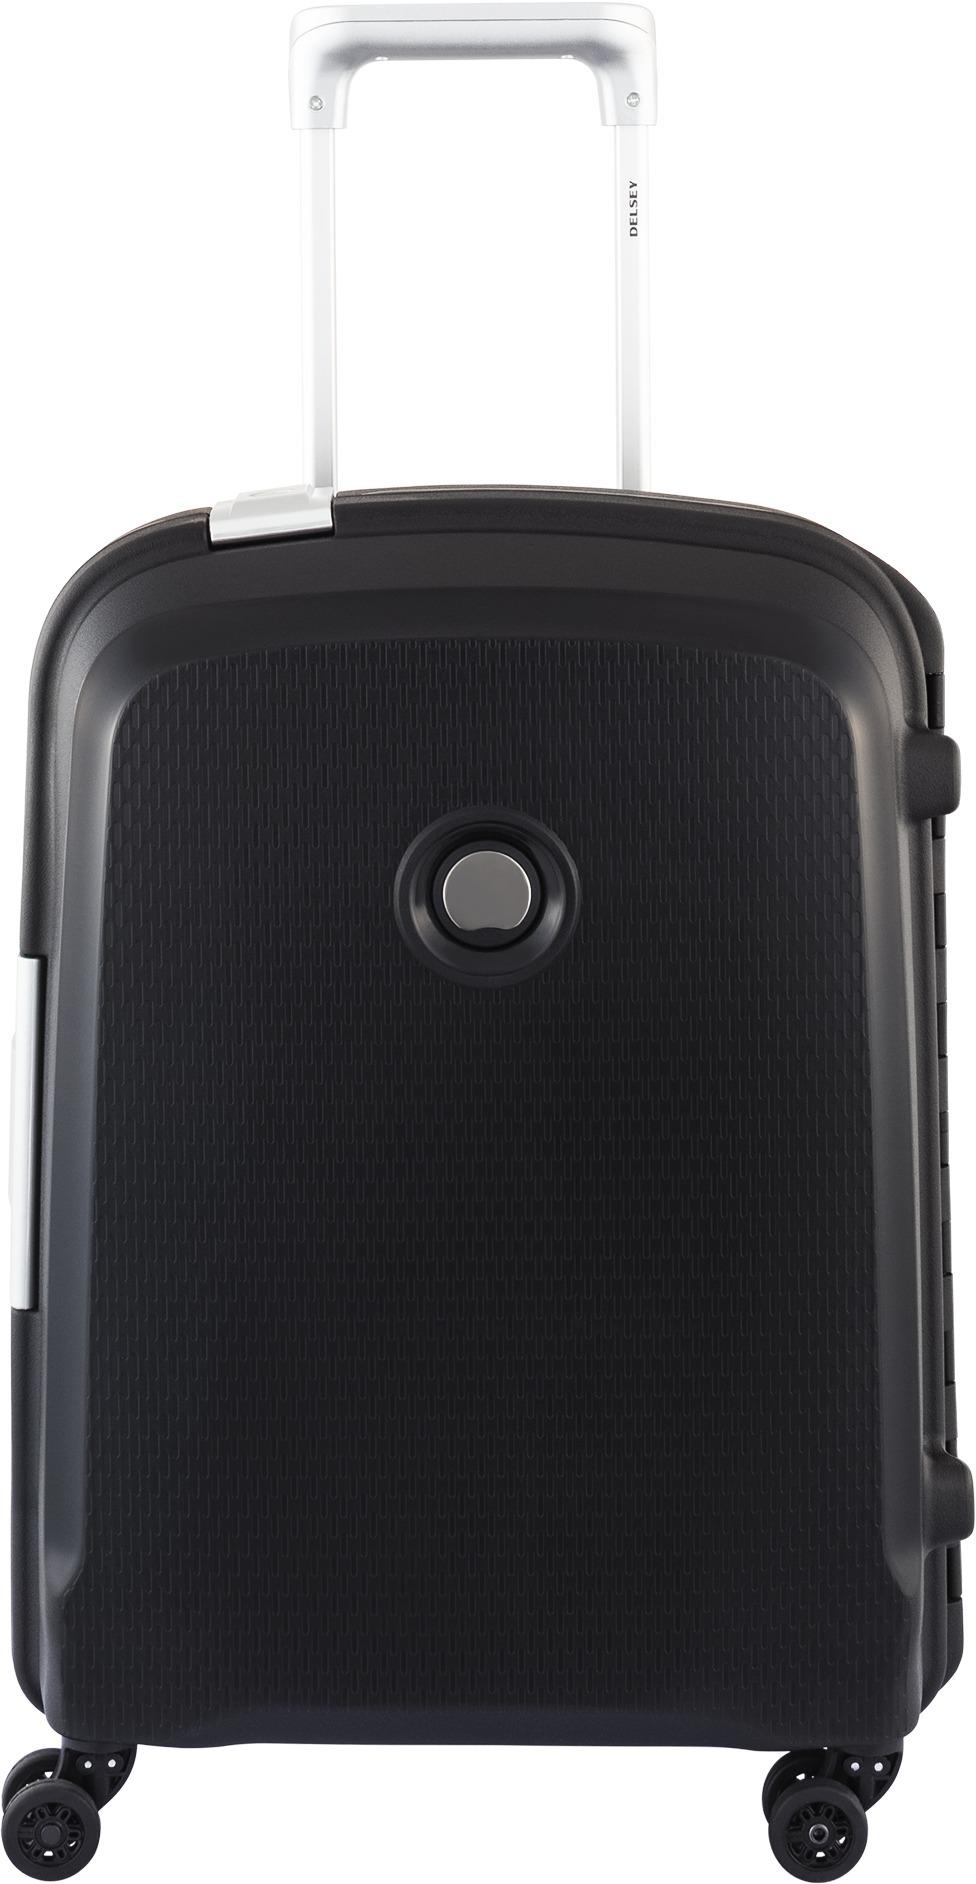 Чемодан Delsey Belfort Plus Slim Cabin Trolley Case 55 см черный смартфон huawei honor 8 lite синий